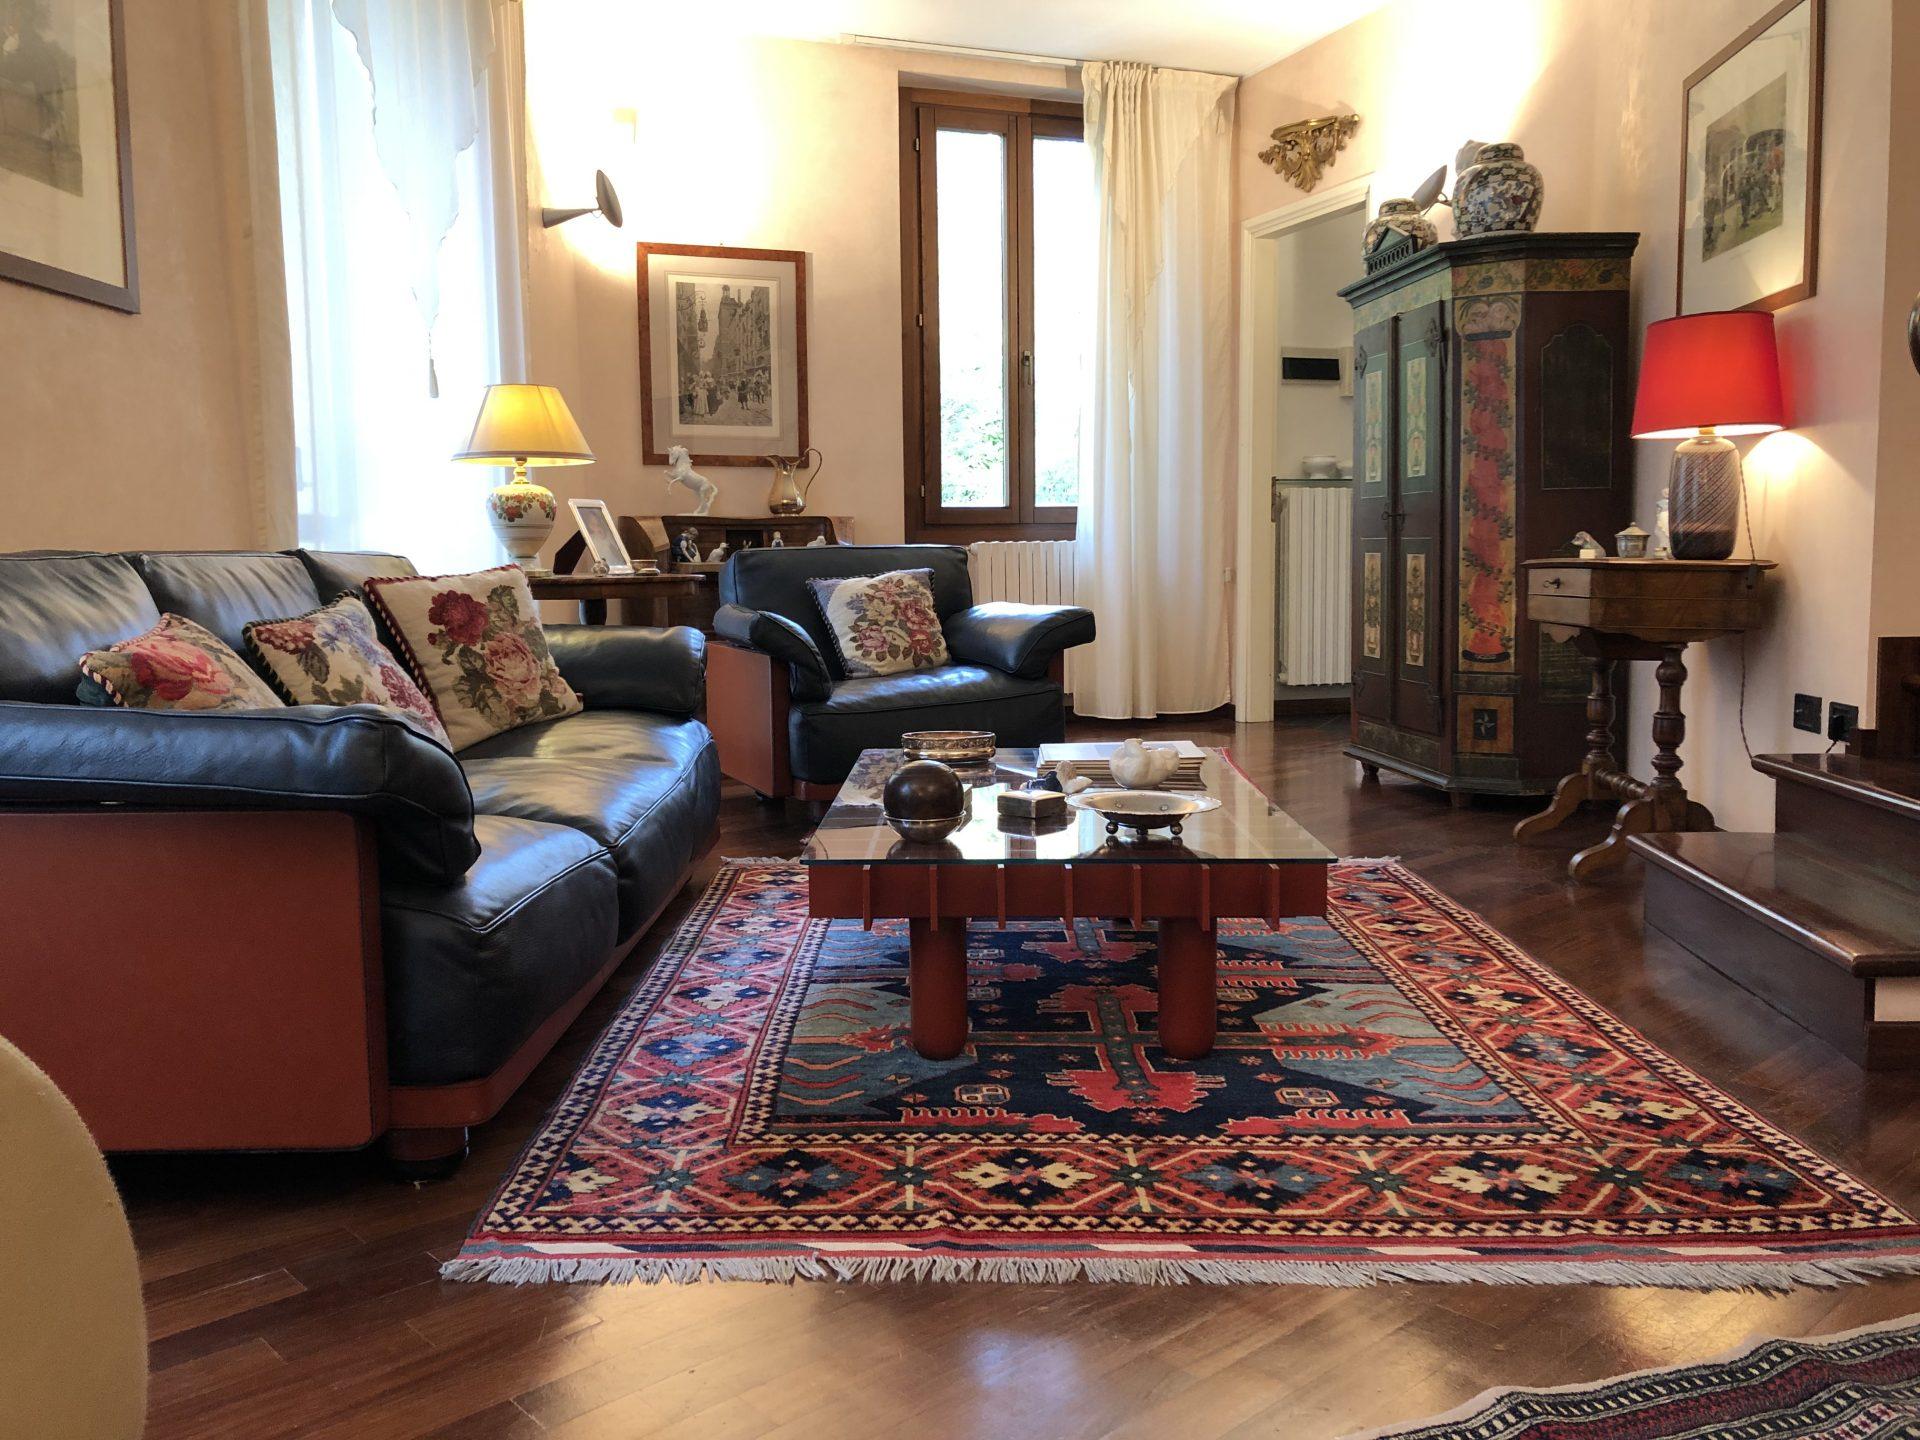 Varese - S. Ambrogio: elegante appartamento su due livelli